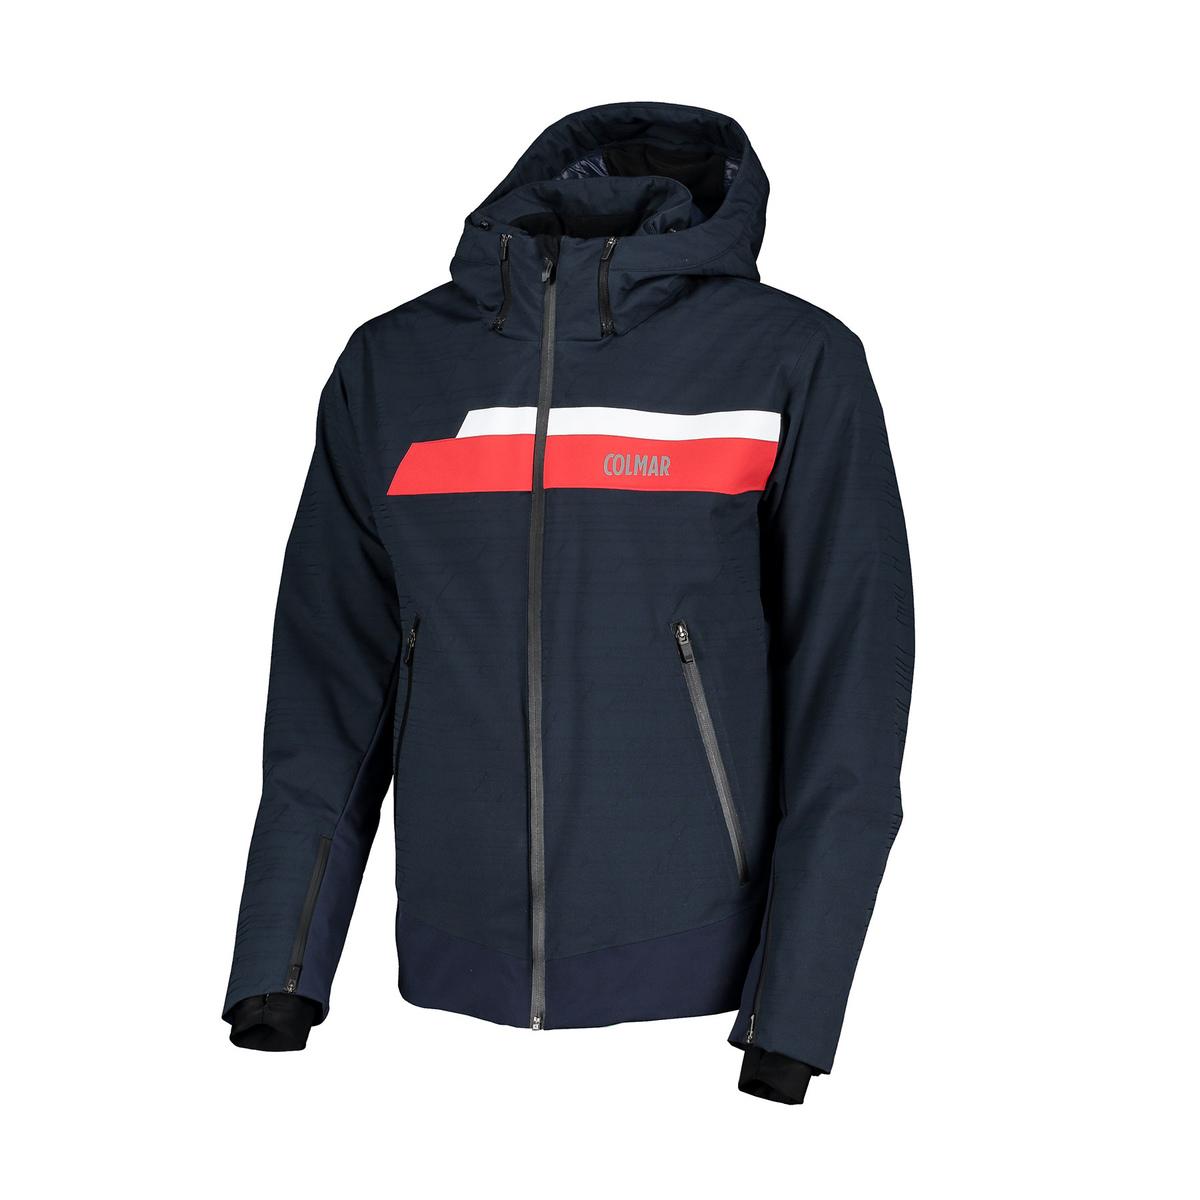 Prezzi Colmar giacca 3-TRE